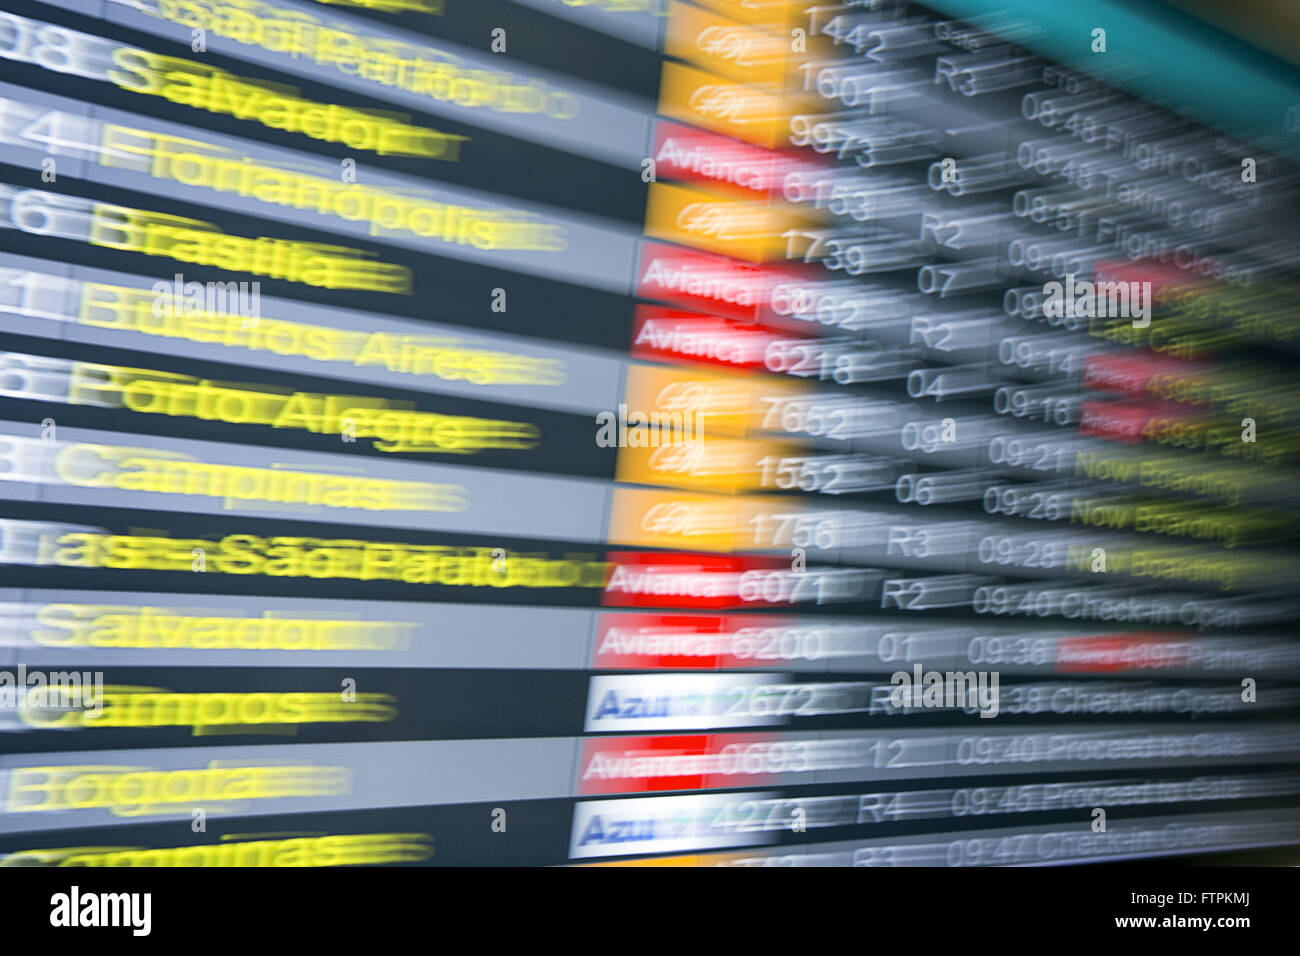 Information panel flights - Stock Image